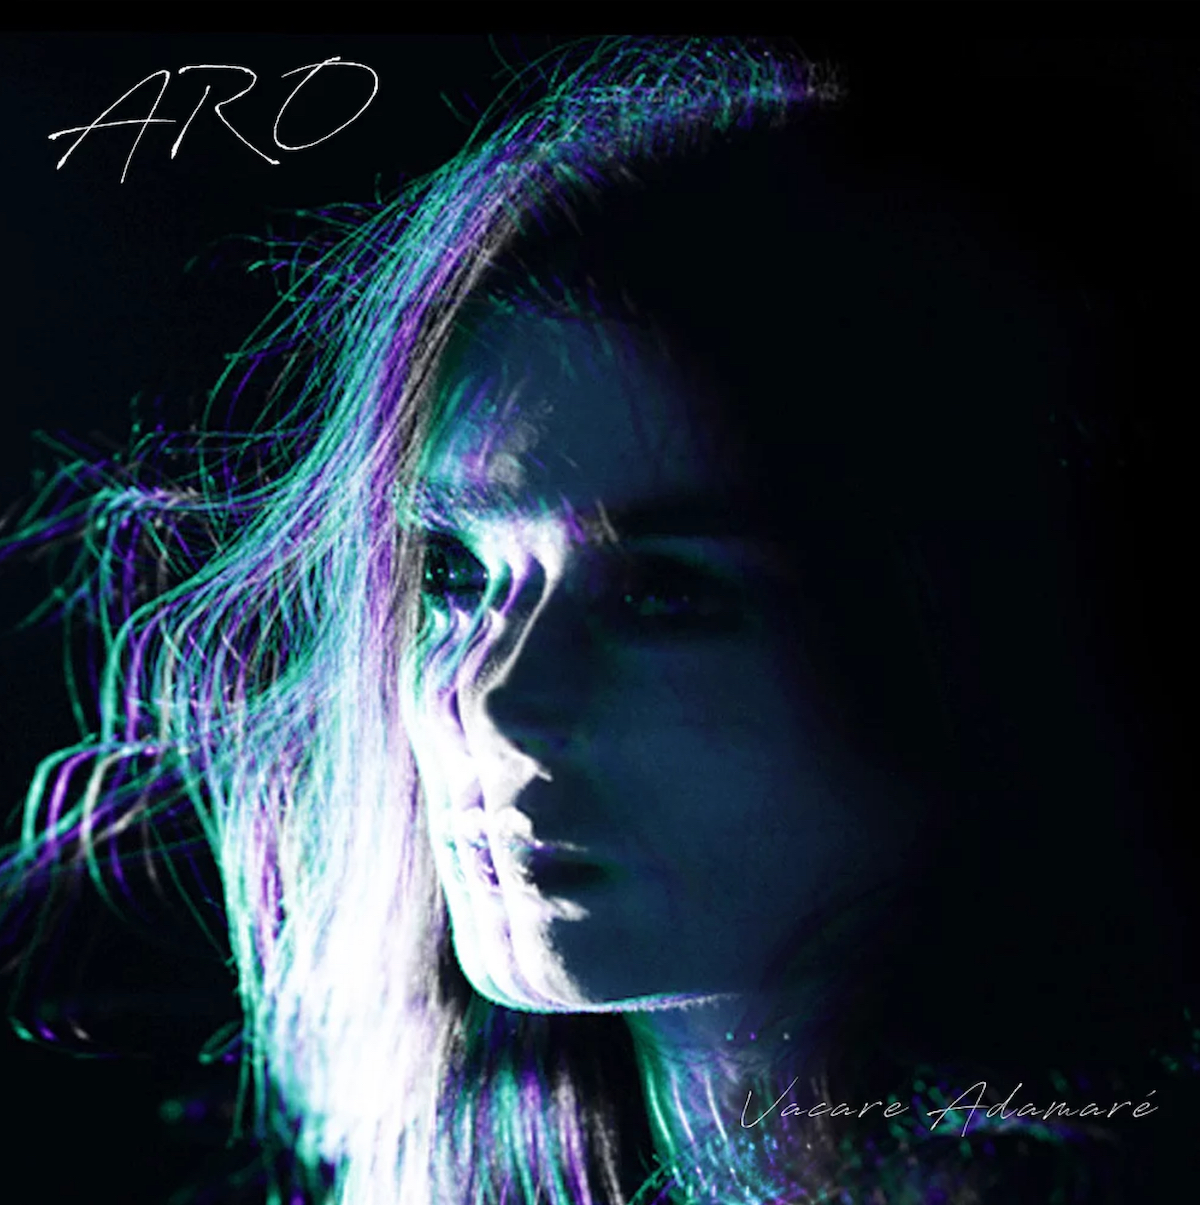 aro aimee osbourne vacare adamare album cover artwork stream track by track interview